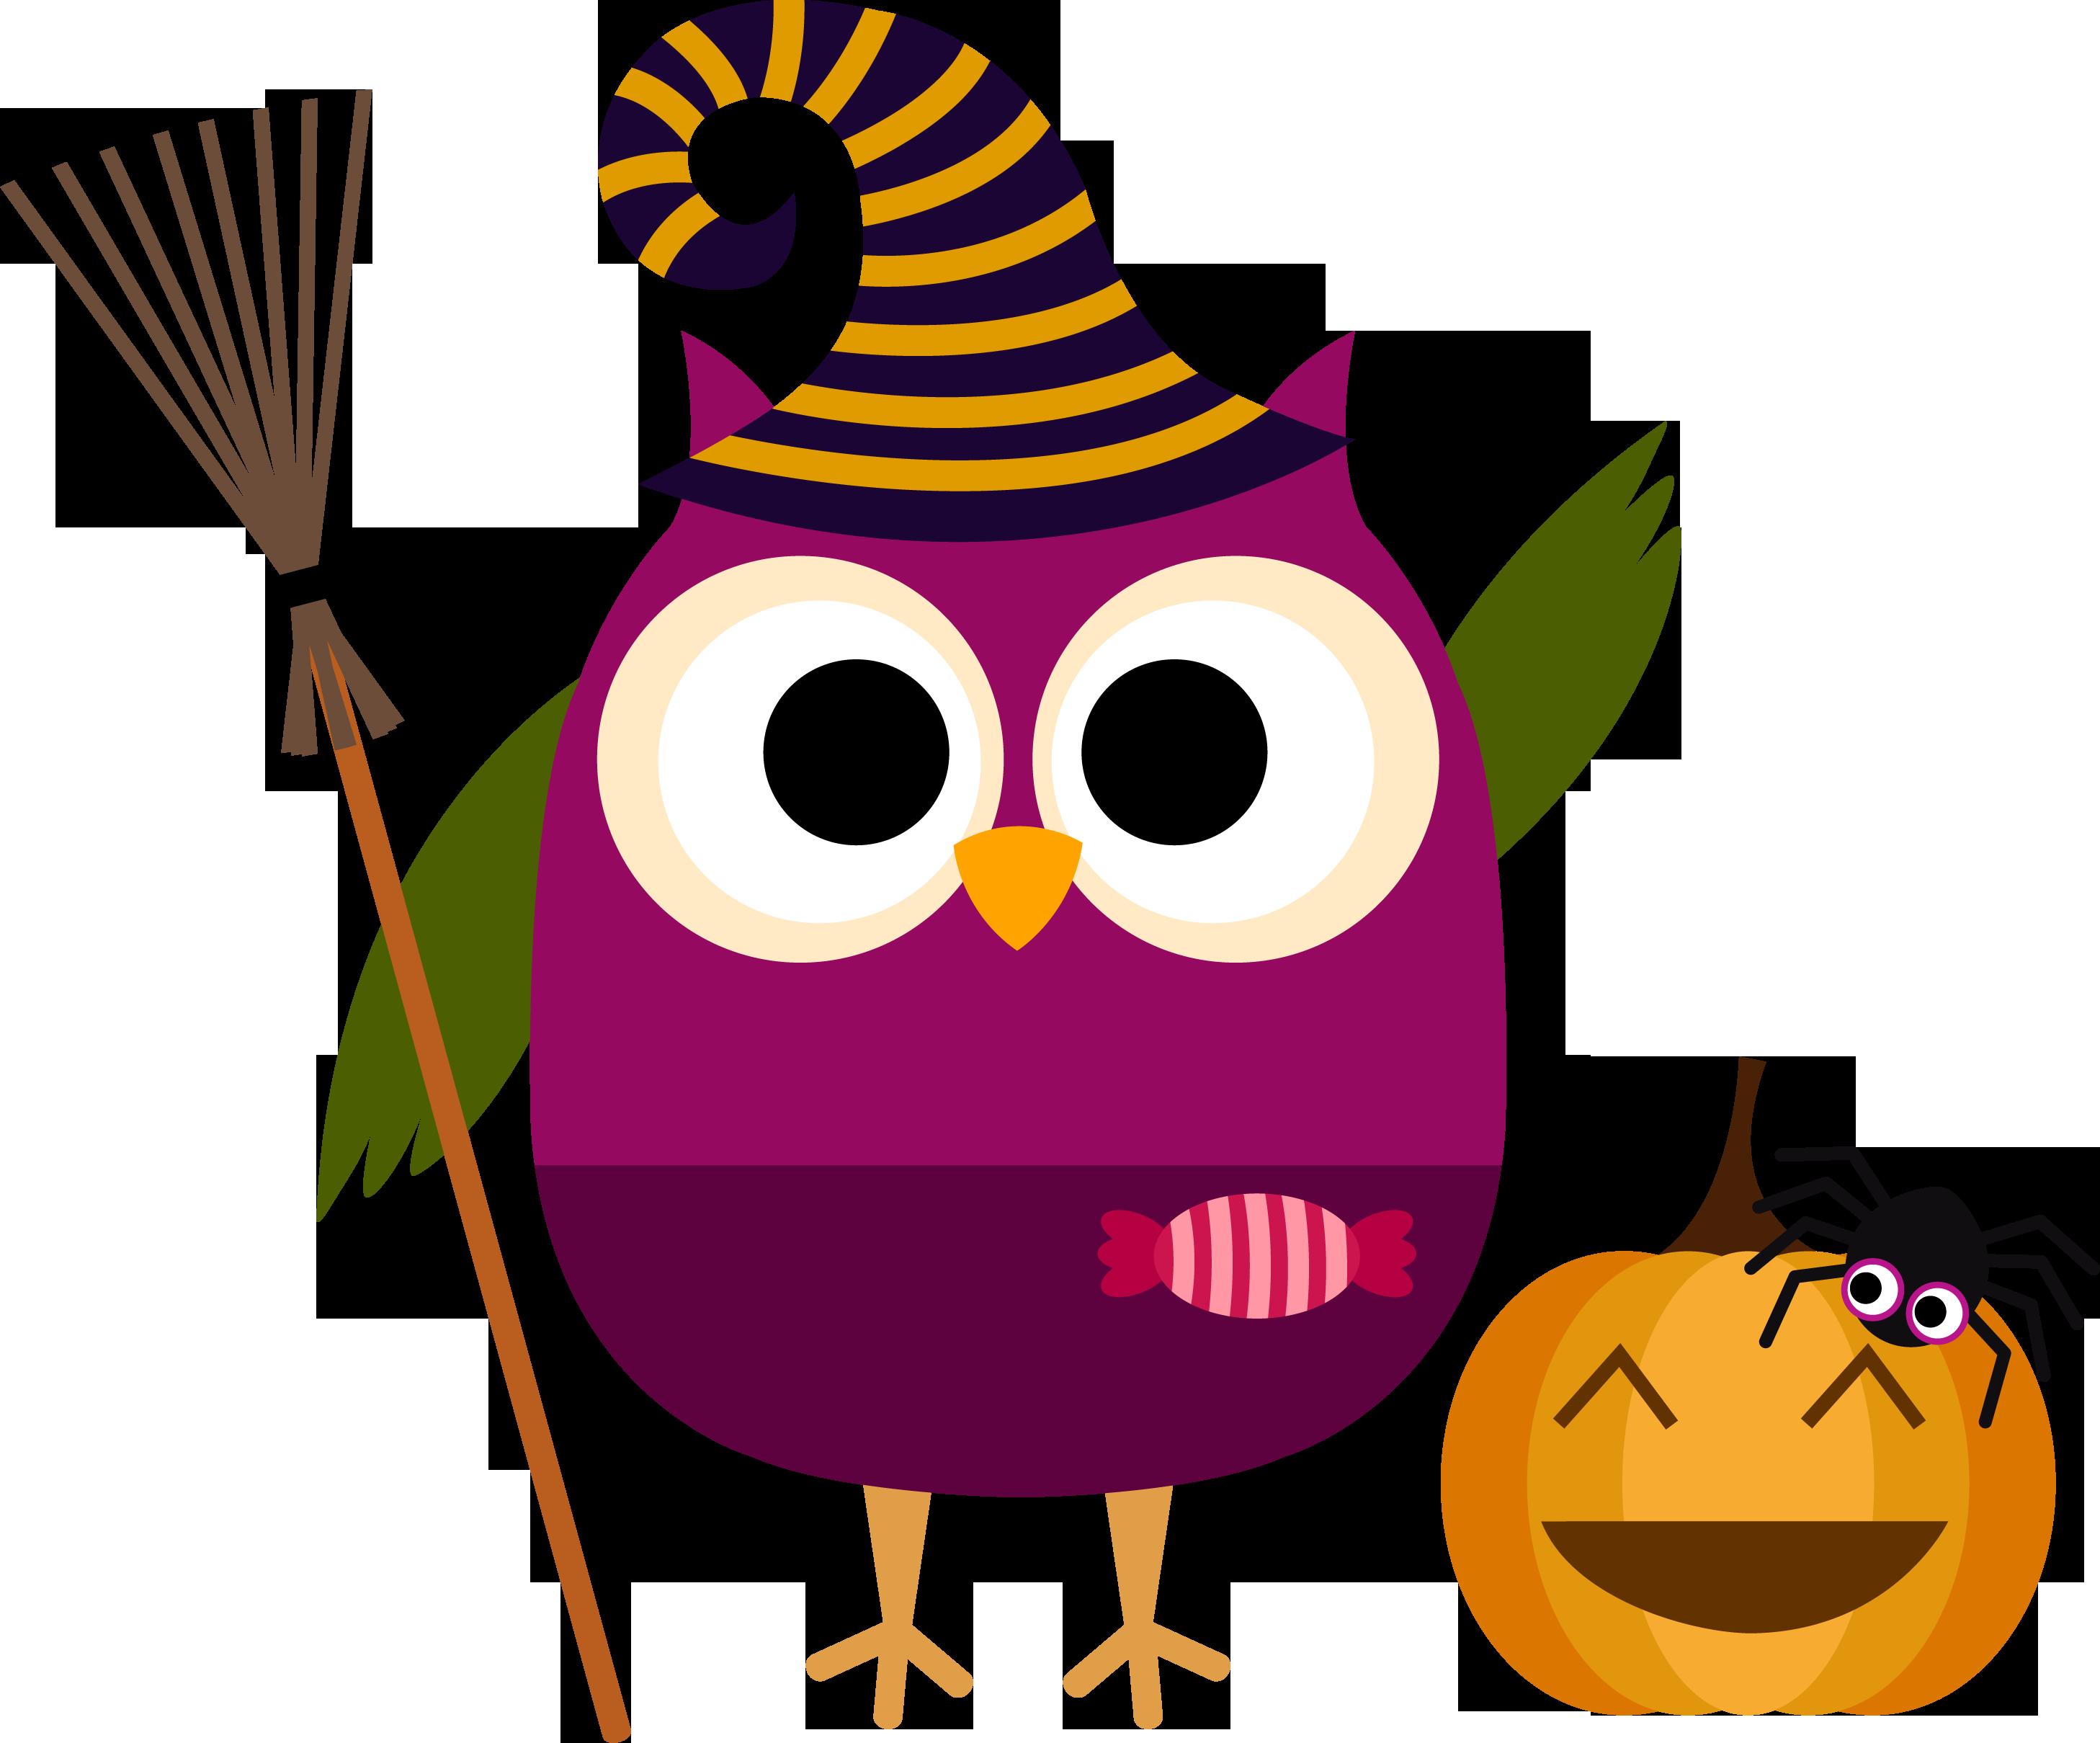 Bc3baho Halloween Png Imagen Png 2915 2419 Pixeles Escalado 26 Halloween Preschool Halloween Images Halloween Owl